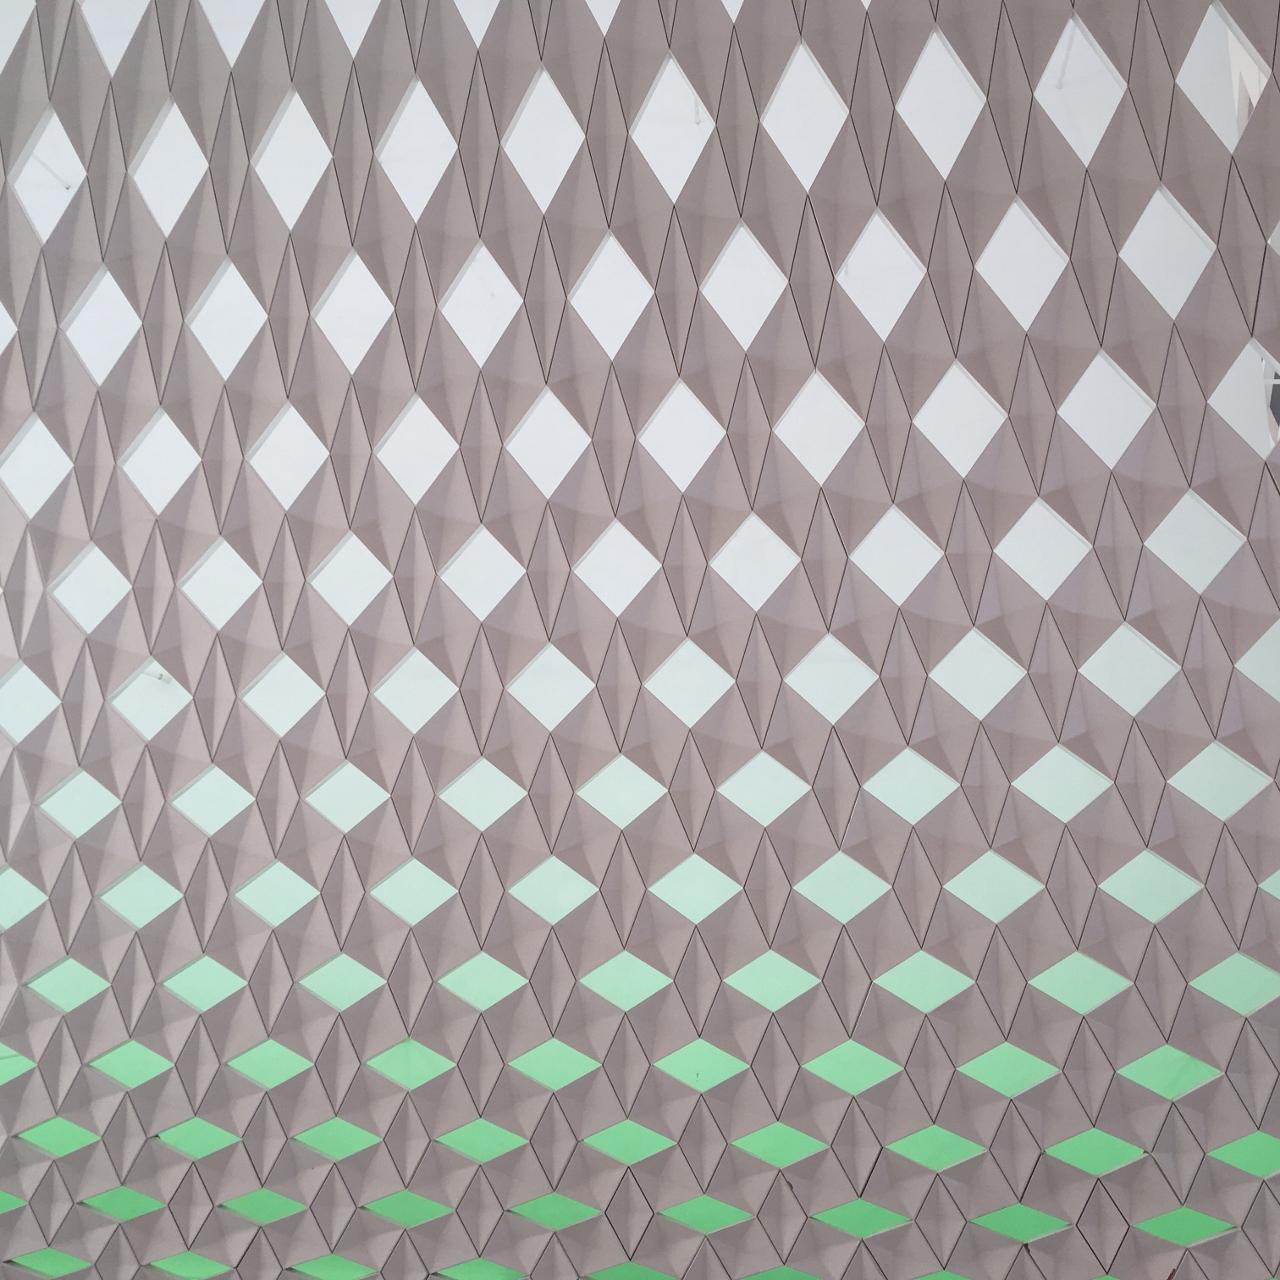 Ice patterns 3 (1280x1280).jpg